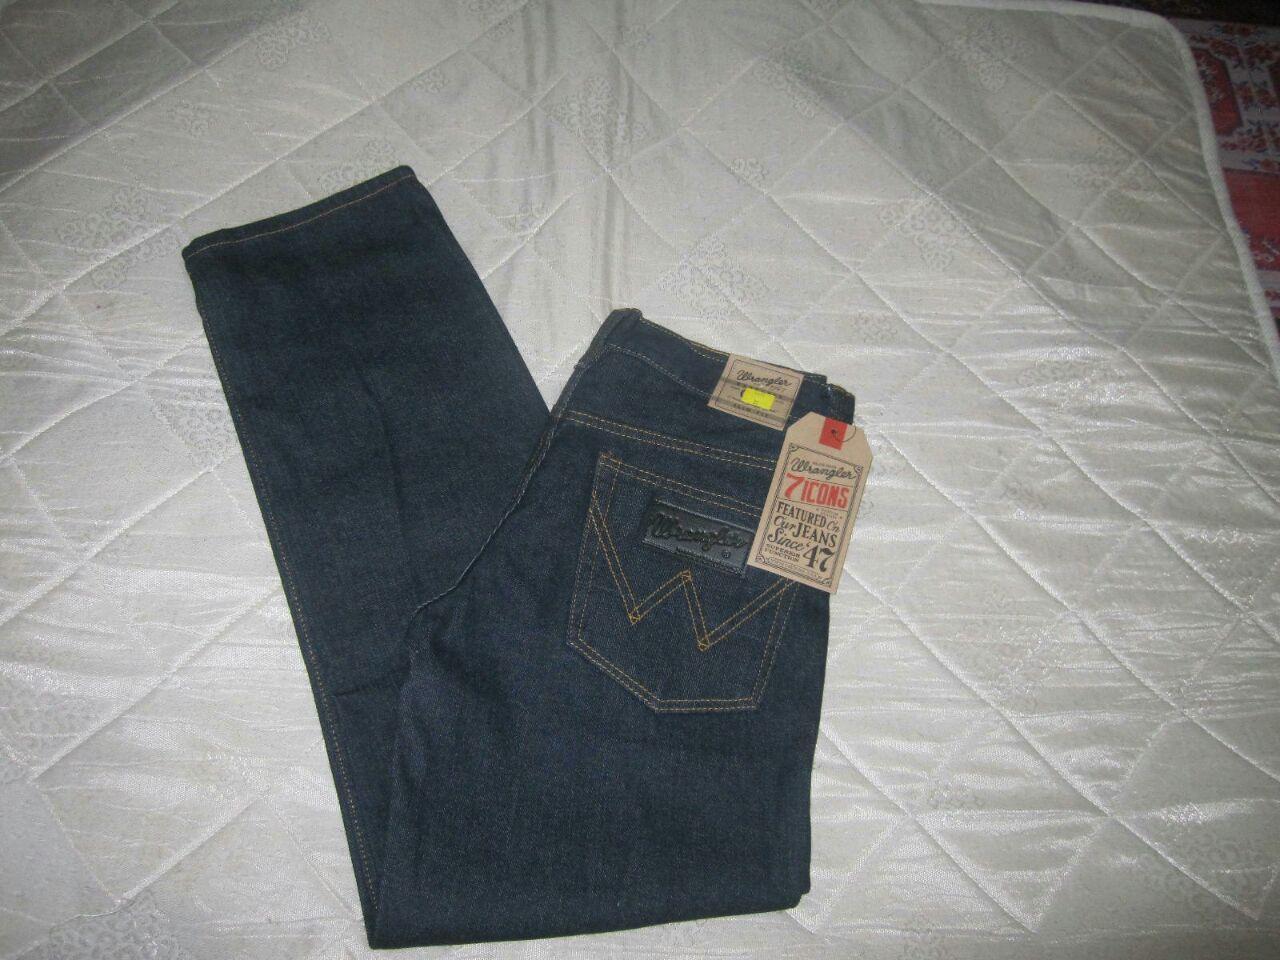 Fitur Celana Jeans Pria Levis Panjang Denim Fashion Standar Biru Laki Standart